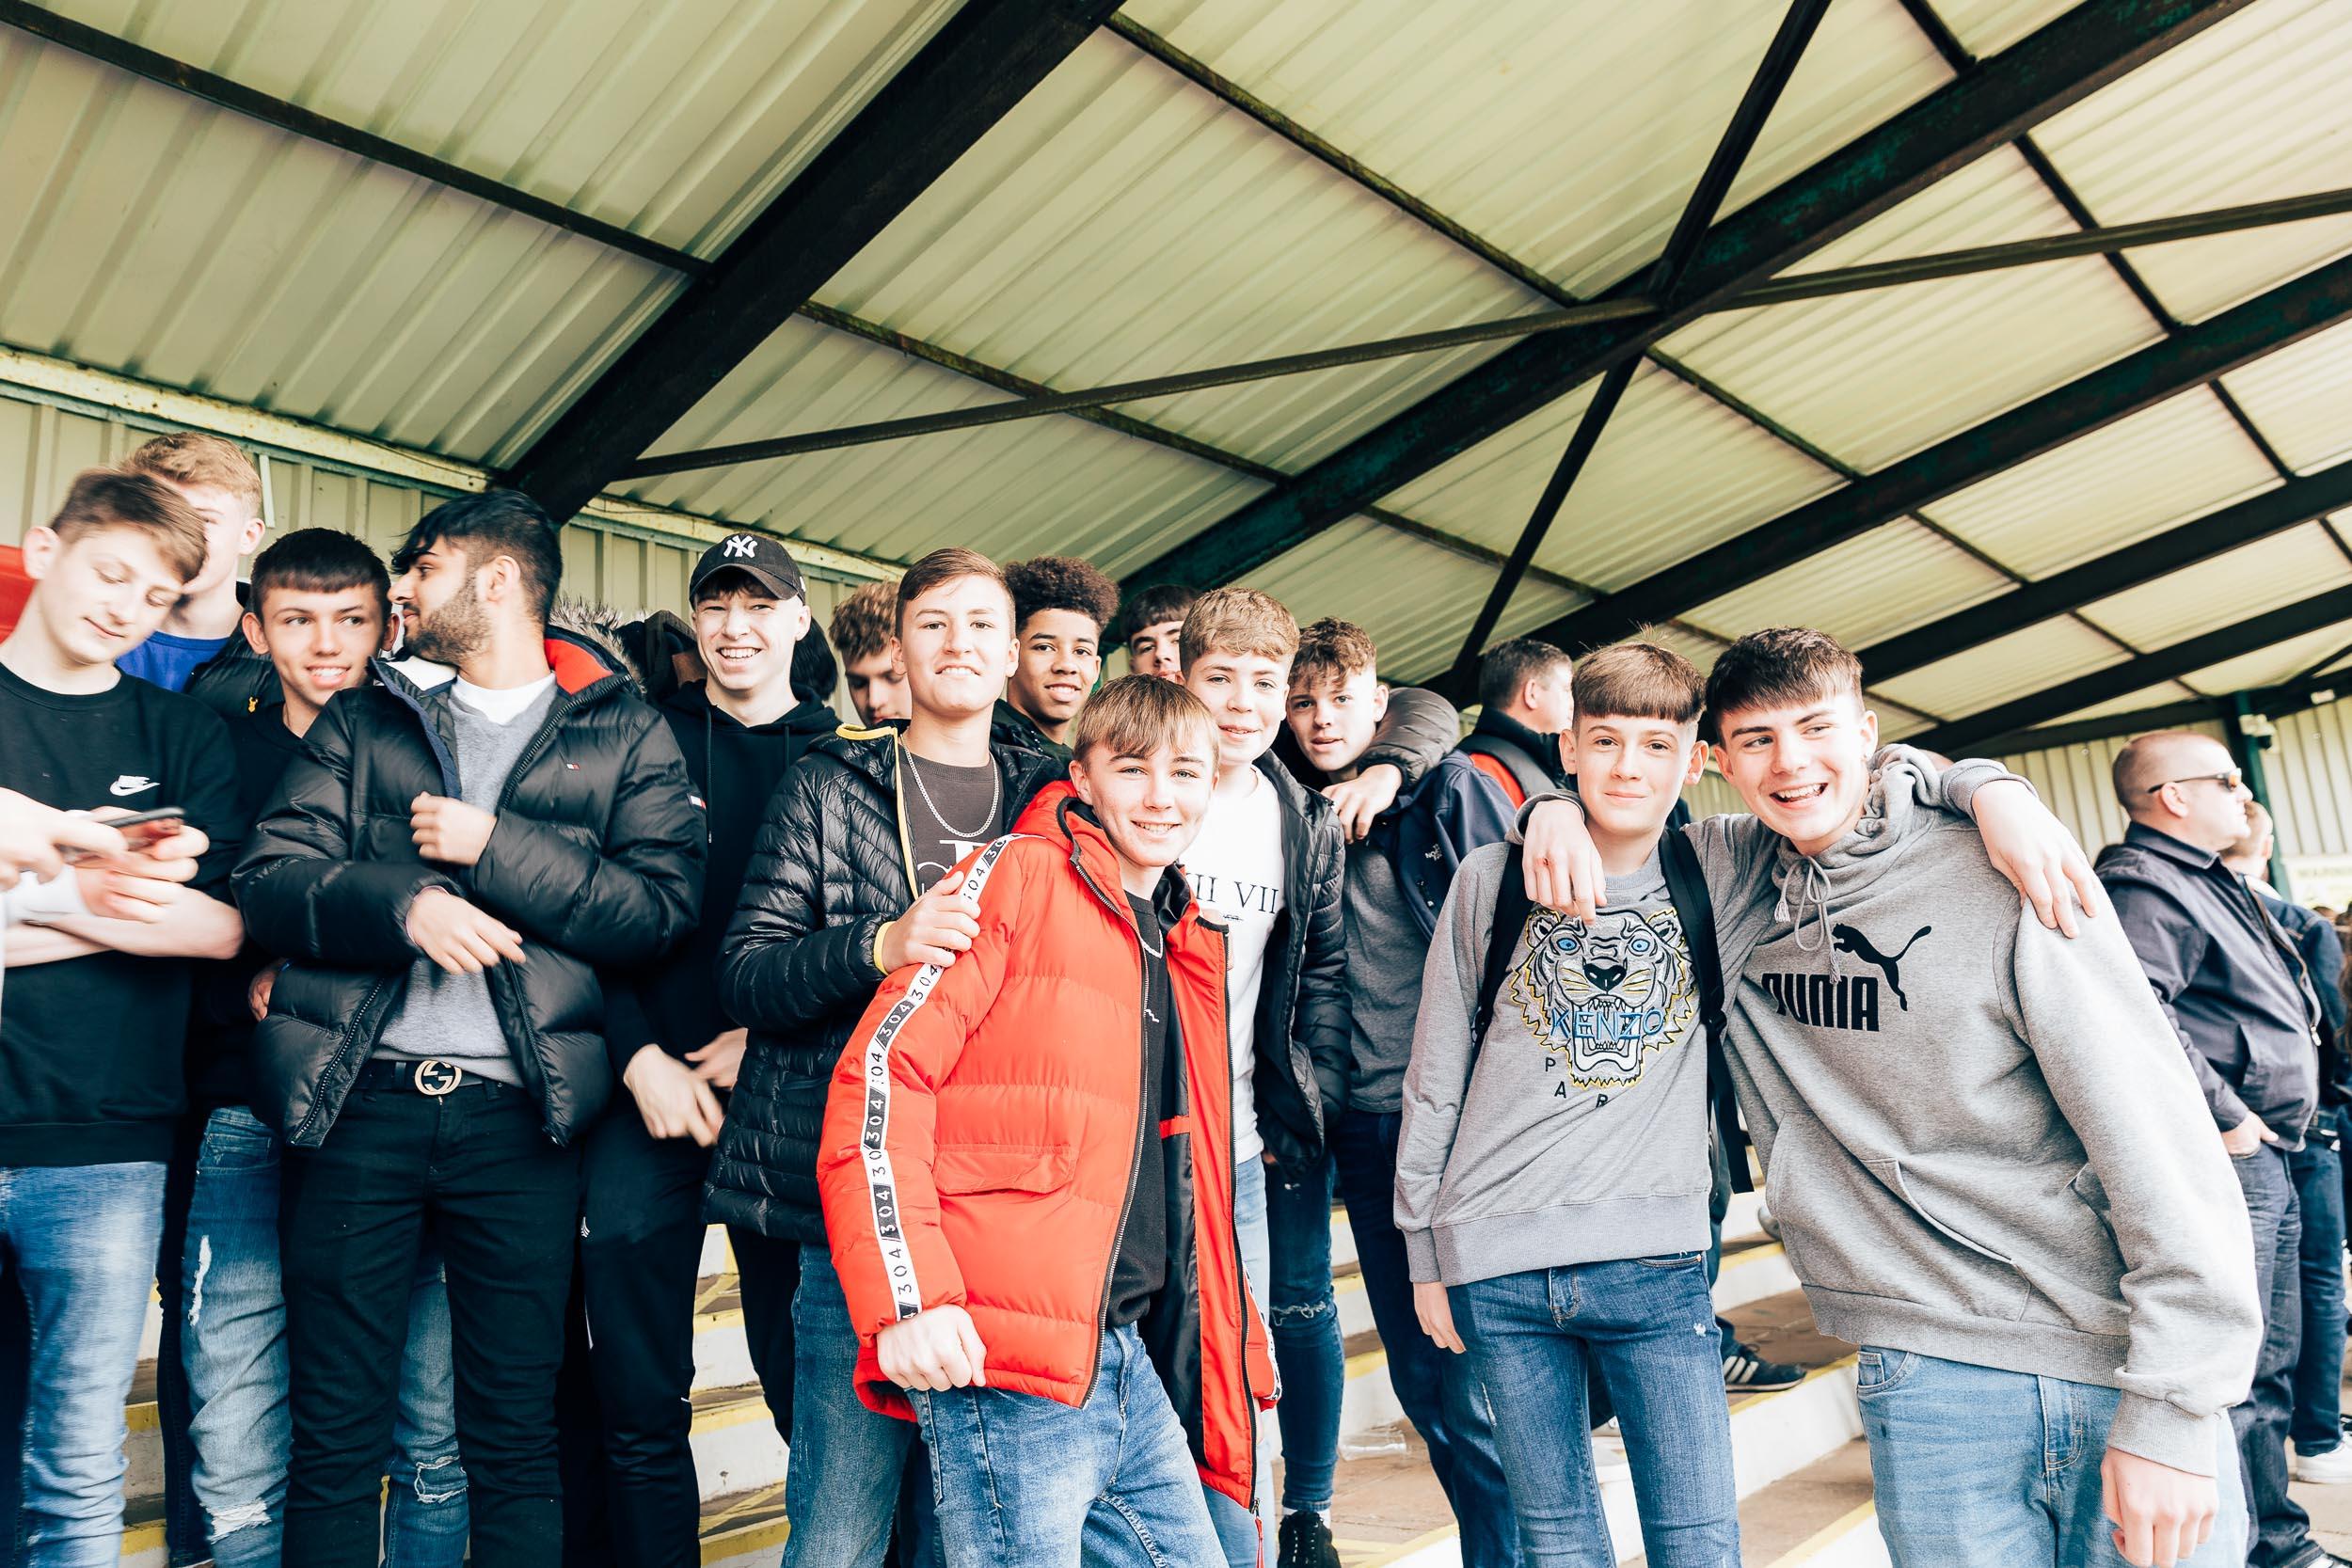 06_05_2019_Bromsgrove_Sporting_Corby-27.jpg